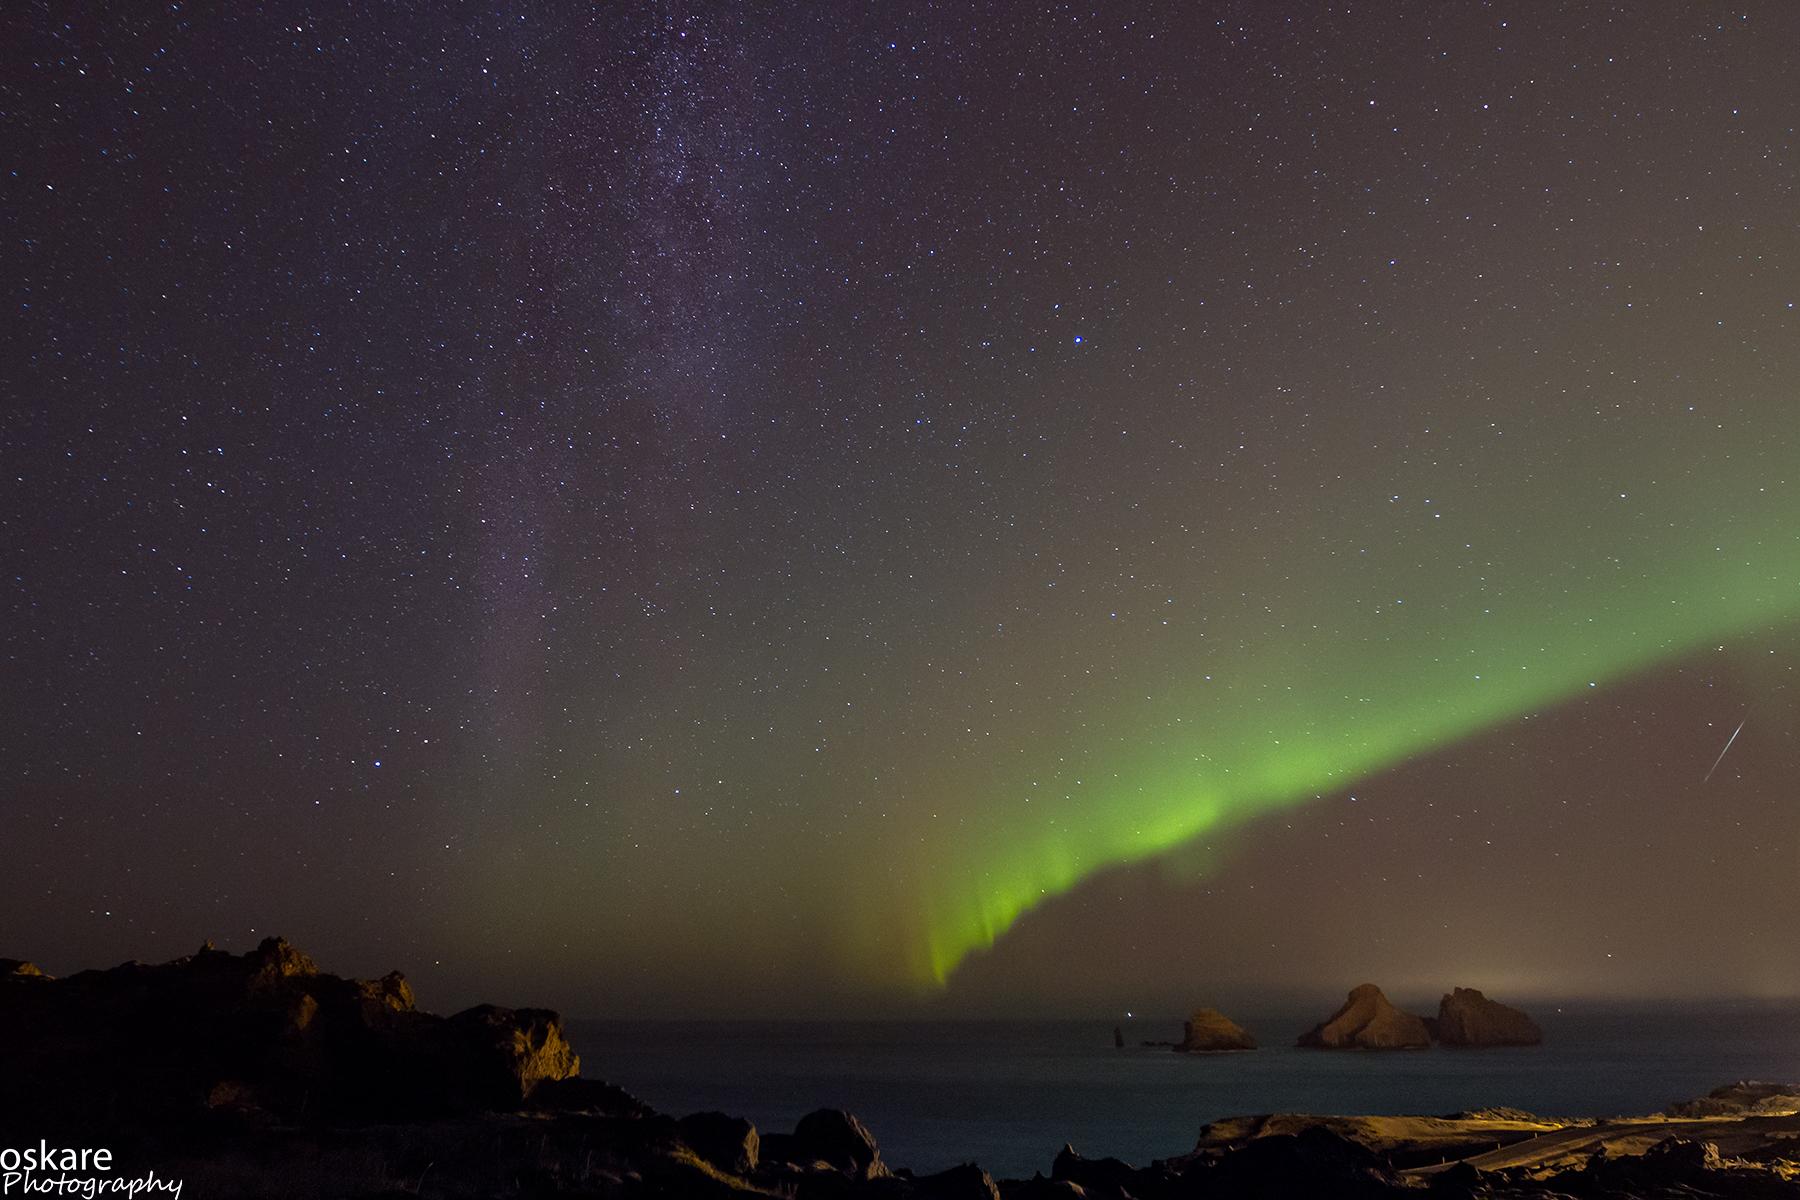 Astronomy Prizes Award Cosmic Achievements by Scientists